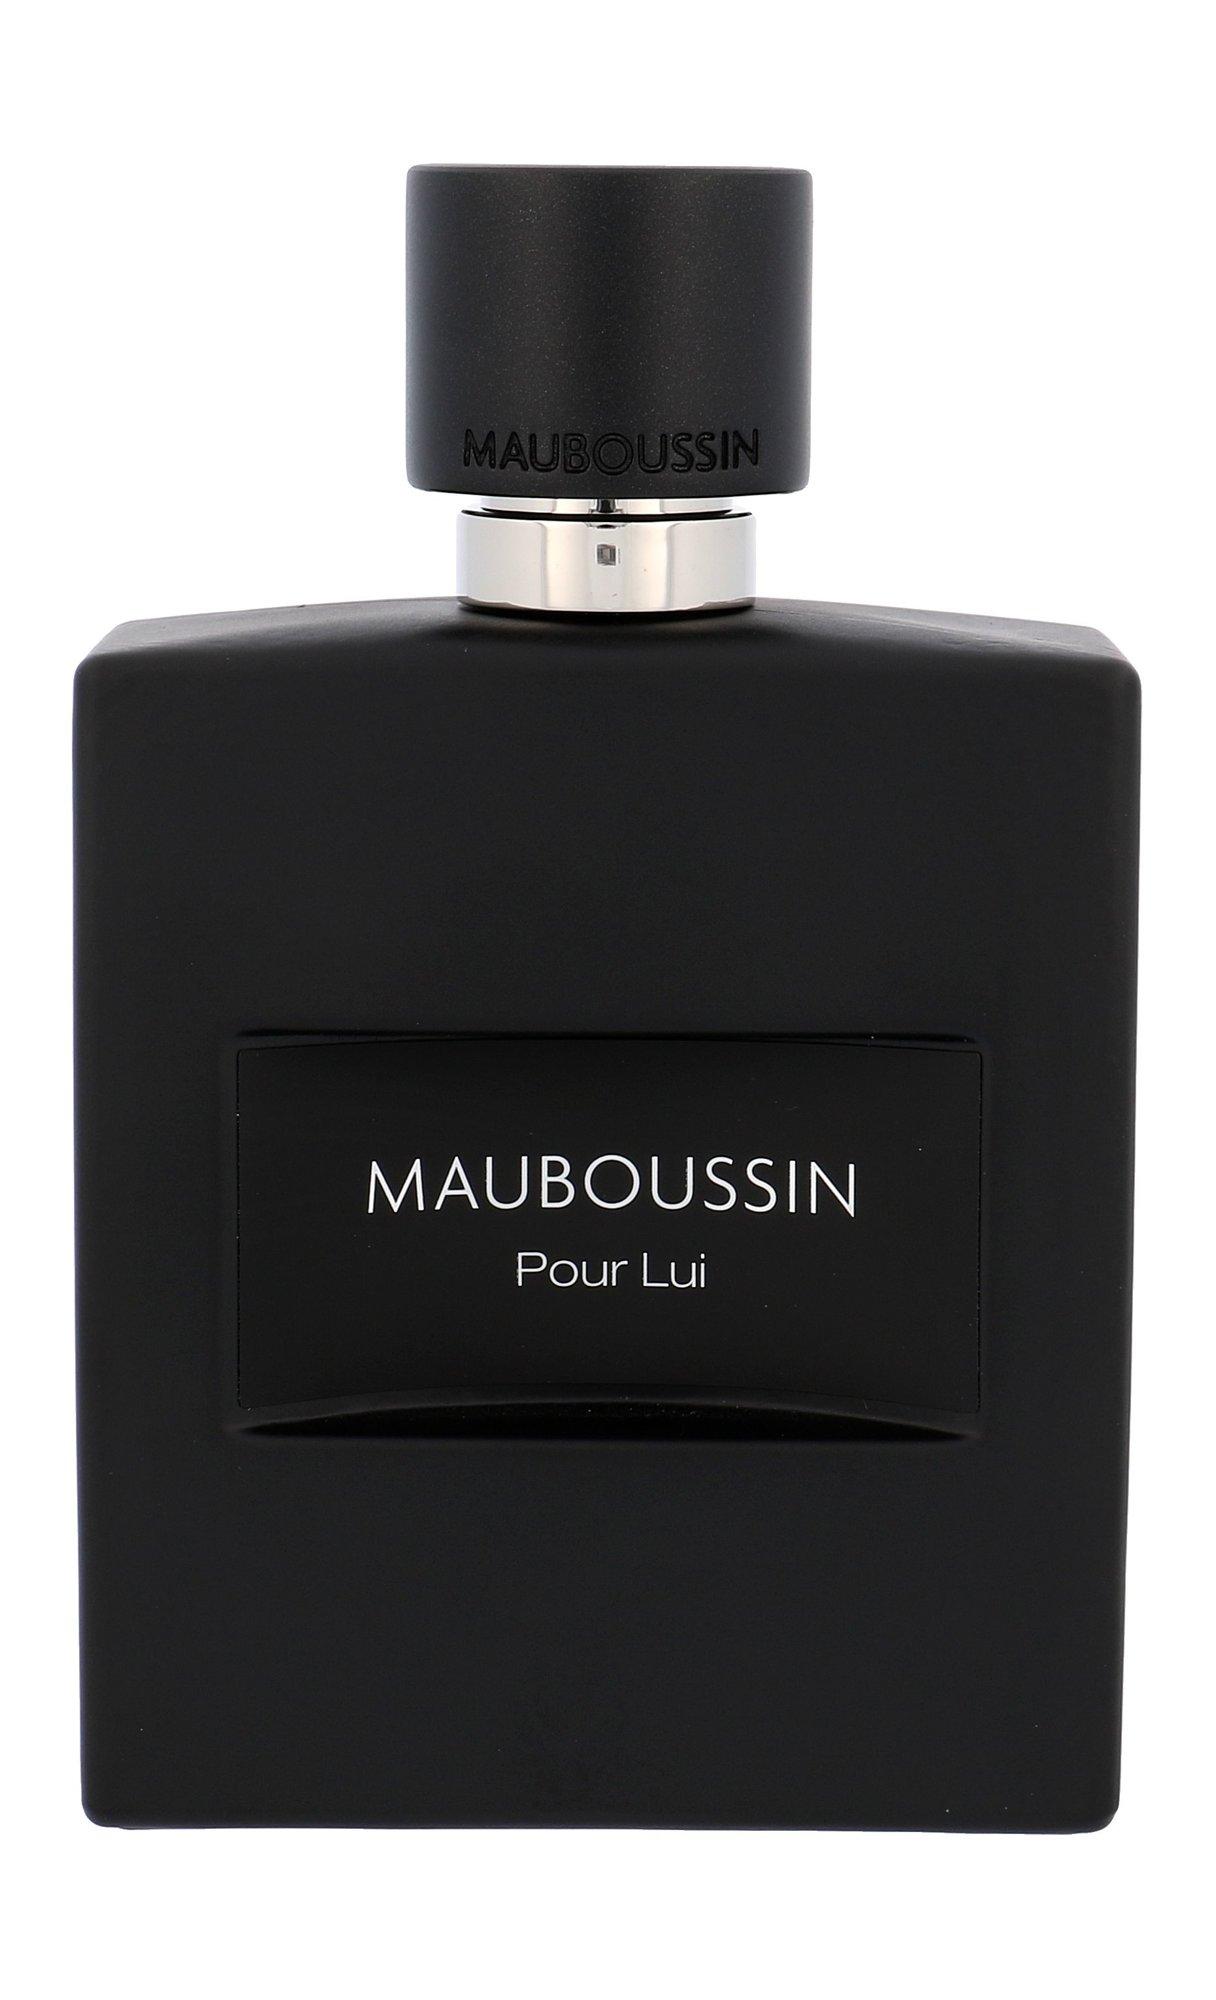 Mauboussin Pour Lui in Black EDP 100ml